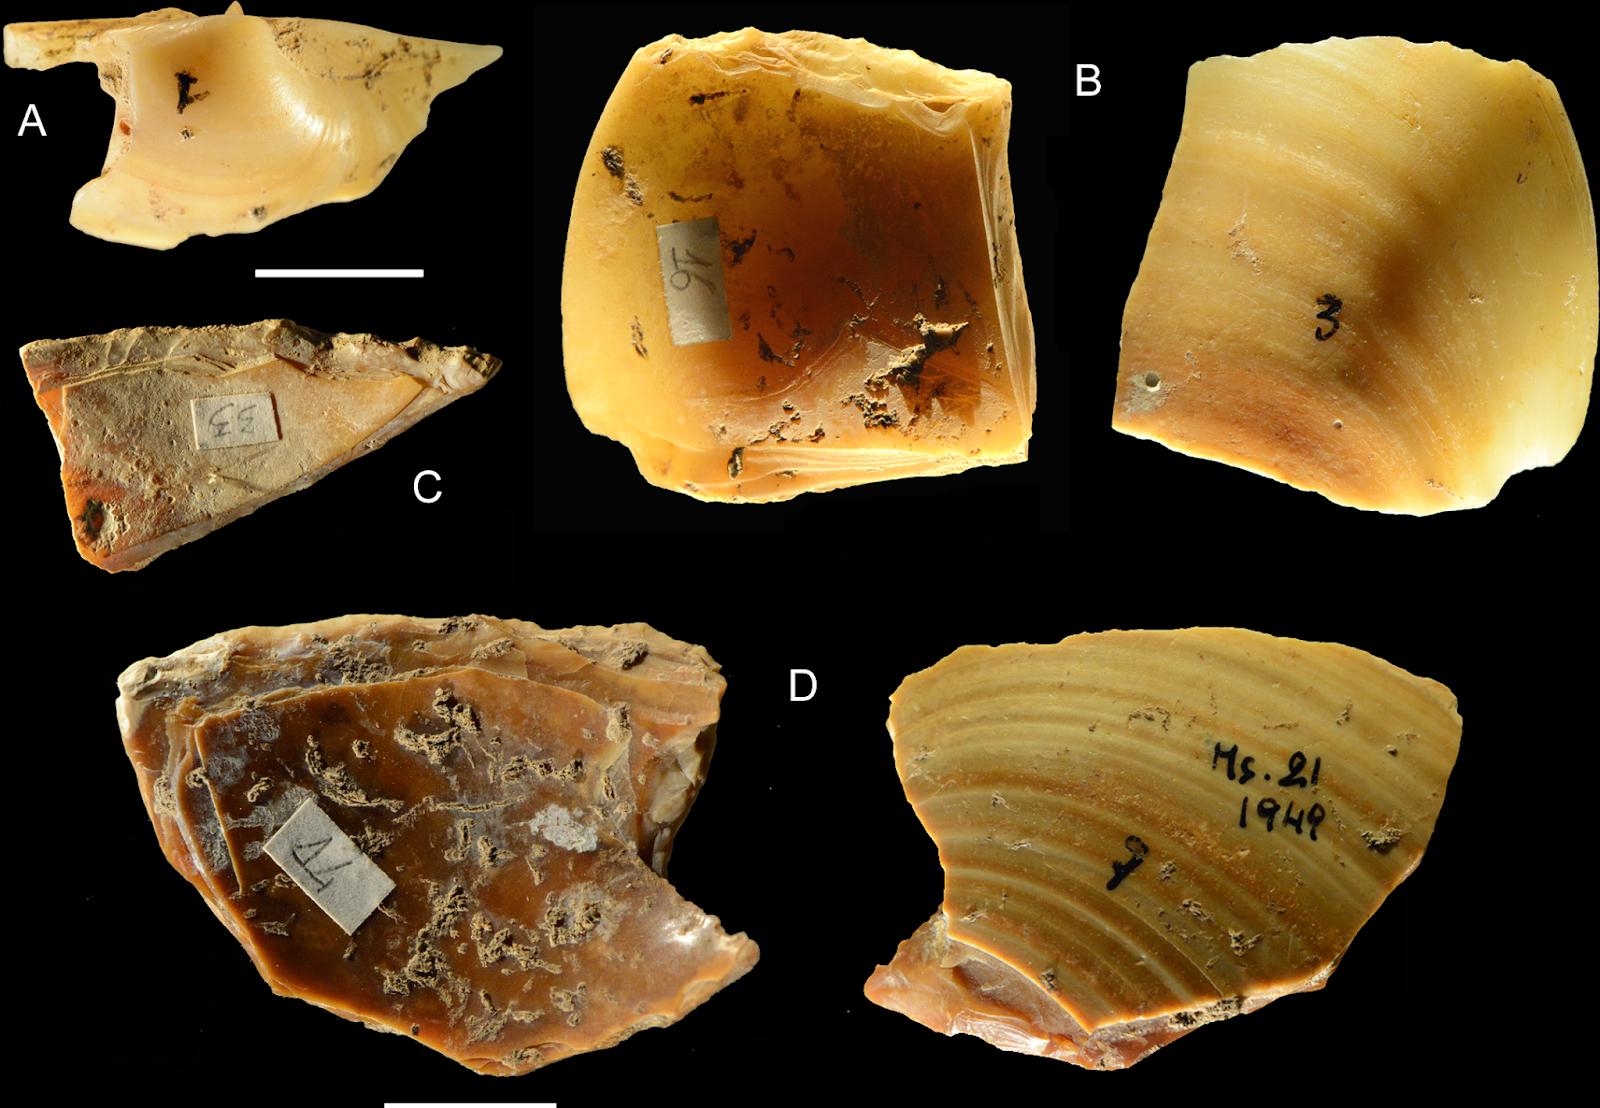 Herramientas fabricadas sobre conchas marinas por neandertales, Grotta dei Moscerini (Italia). Foto: Villa et alii.